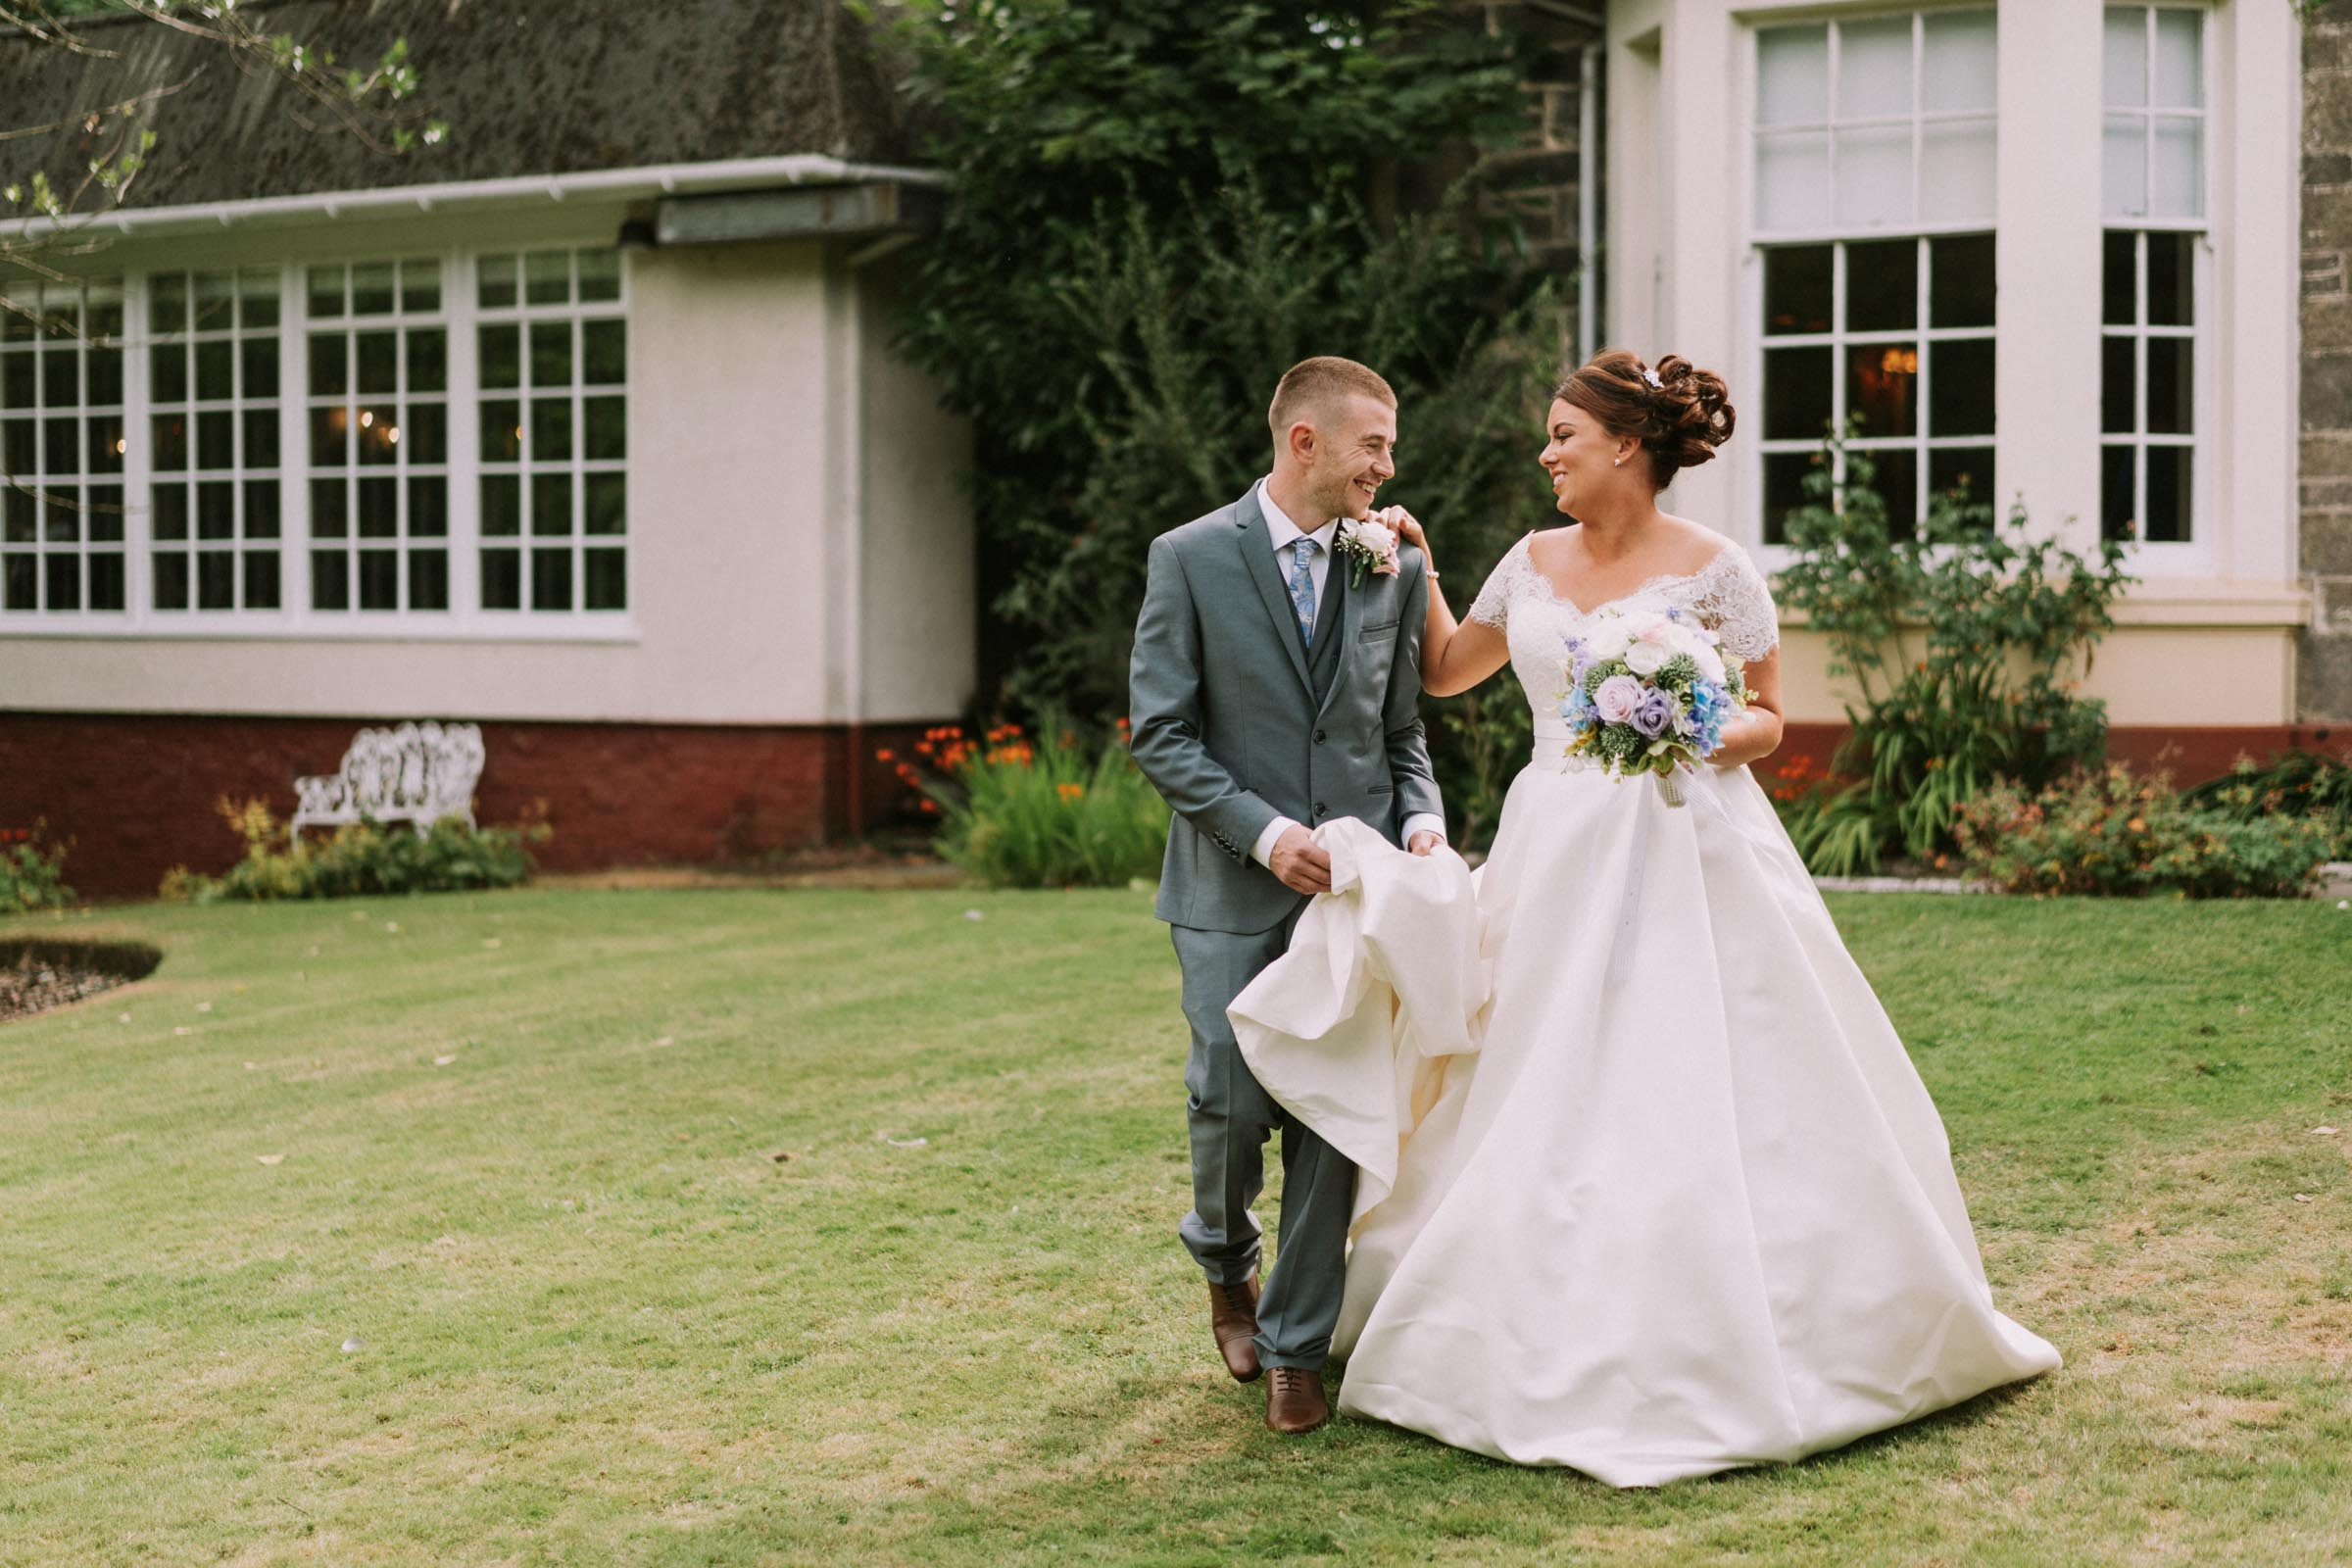 Dalmeny-Park-Glasgow-Wedding-Dearly-Photography-Scotland (37 of 75).jpg